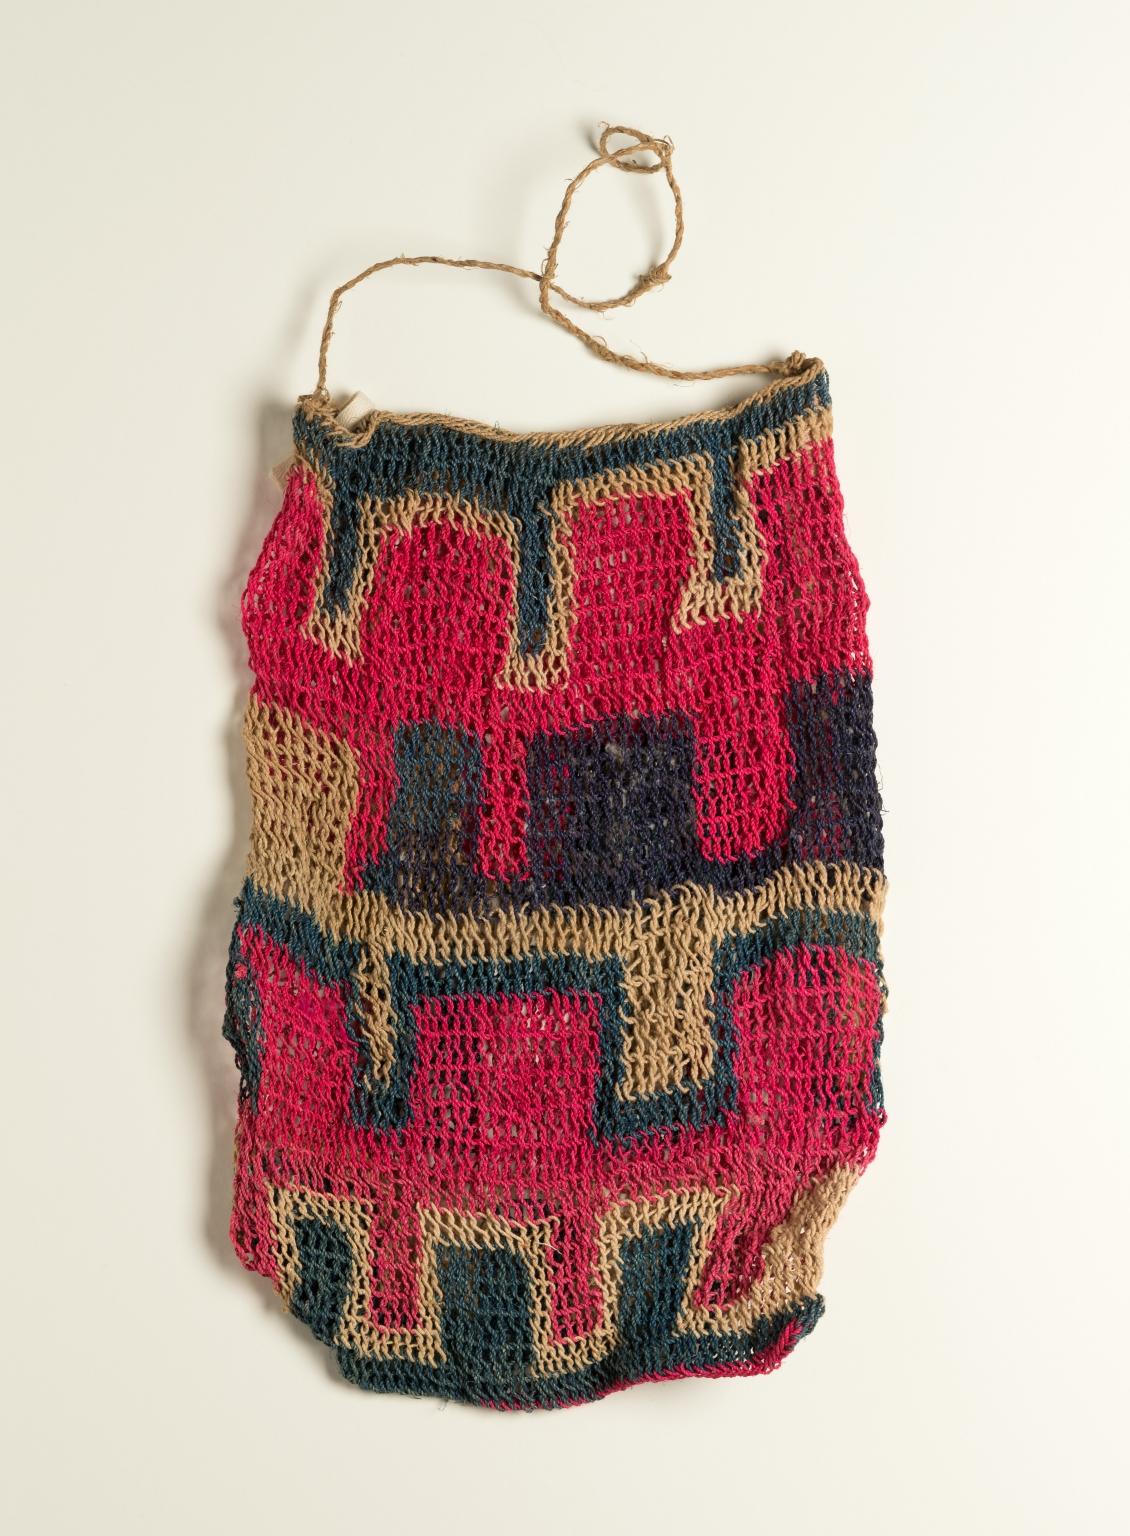 Yagaria Bilum (Carrying Bag)